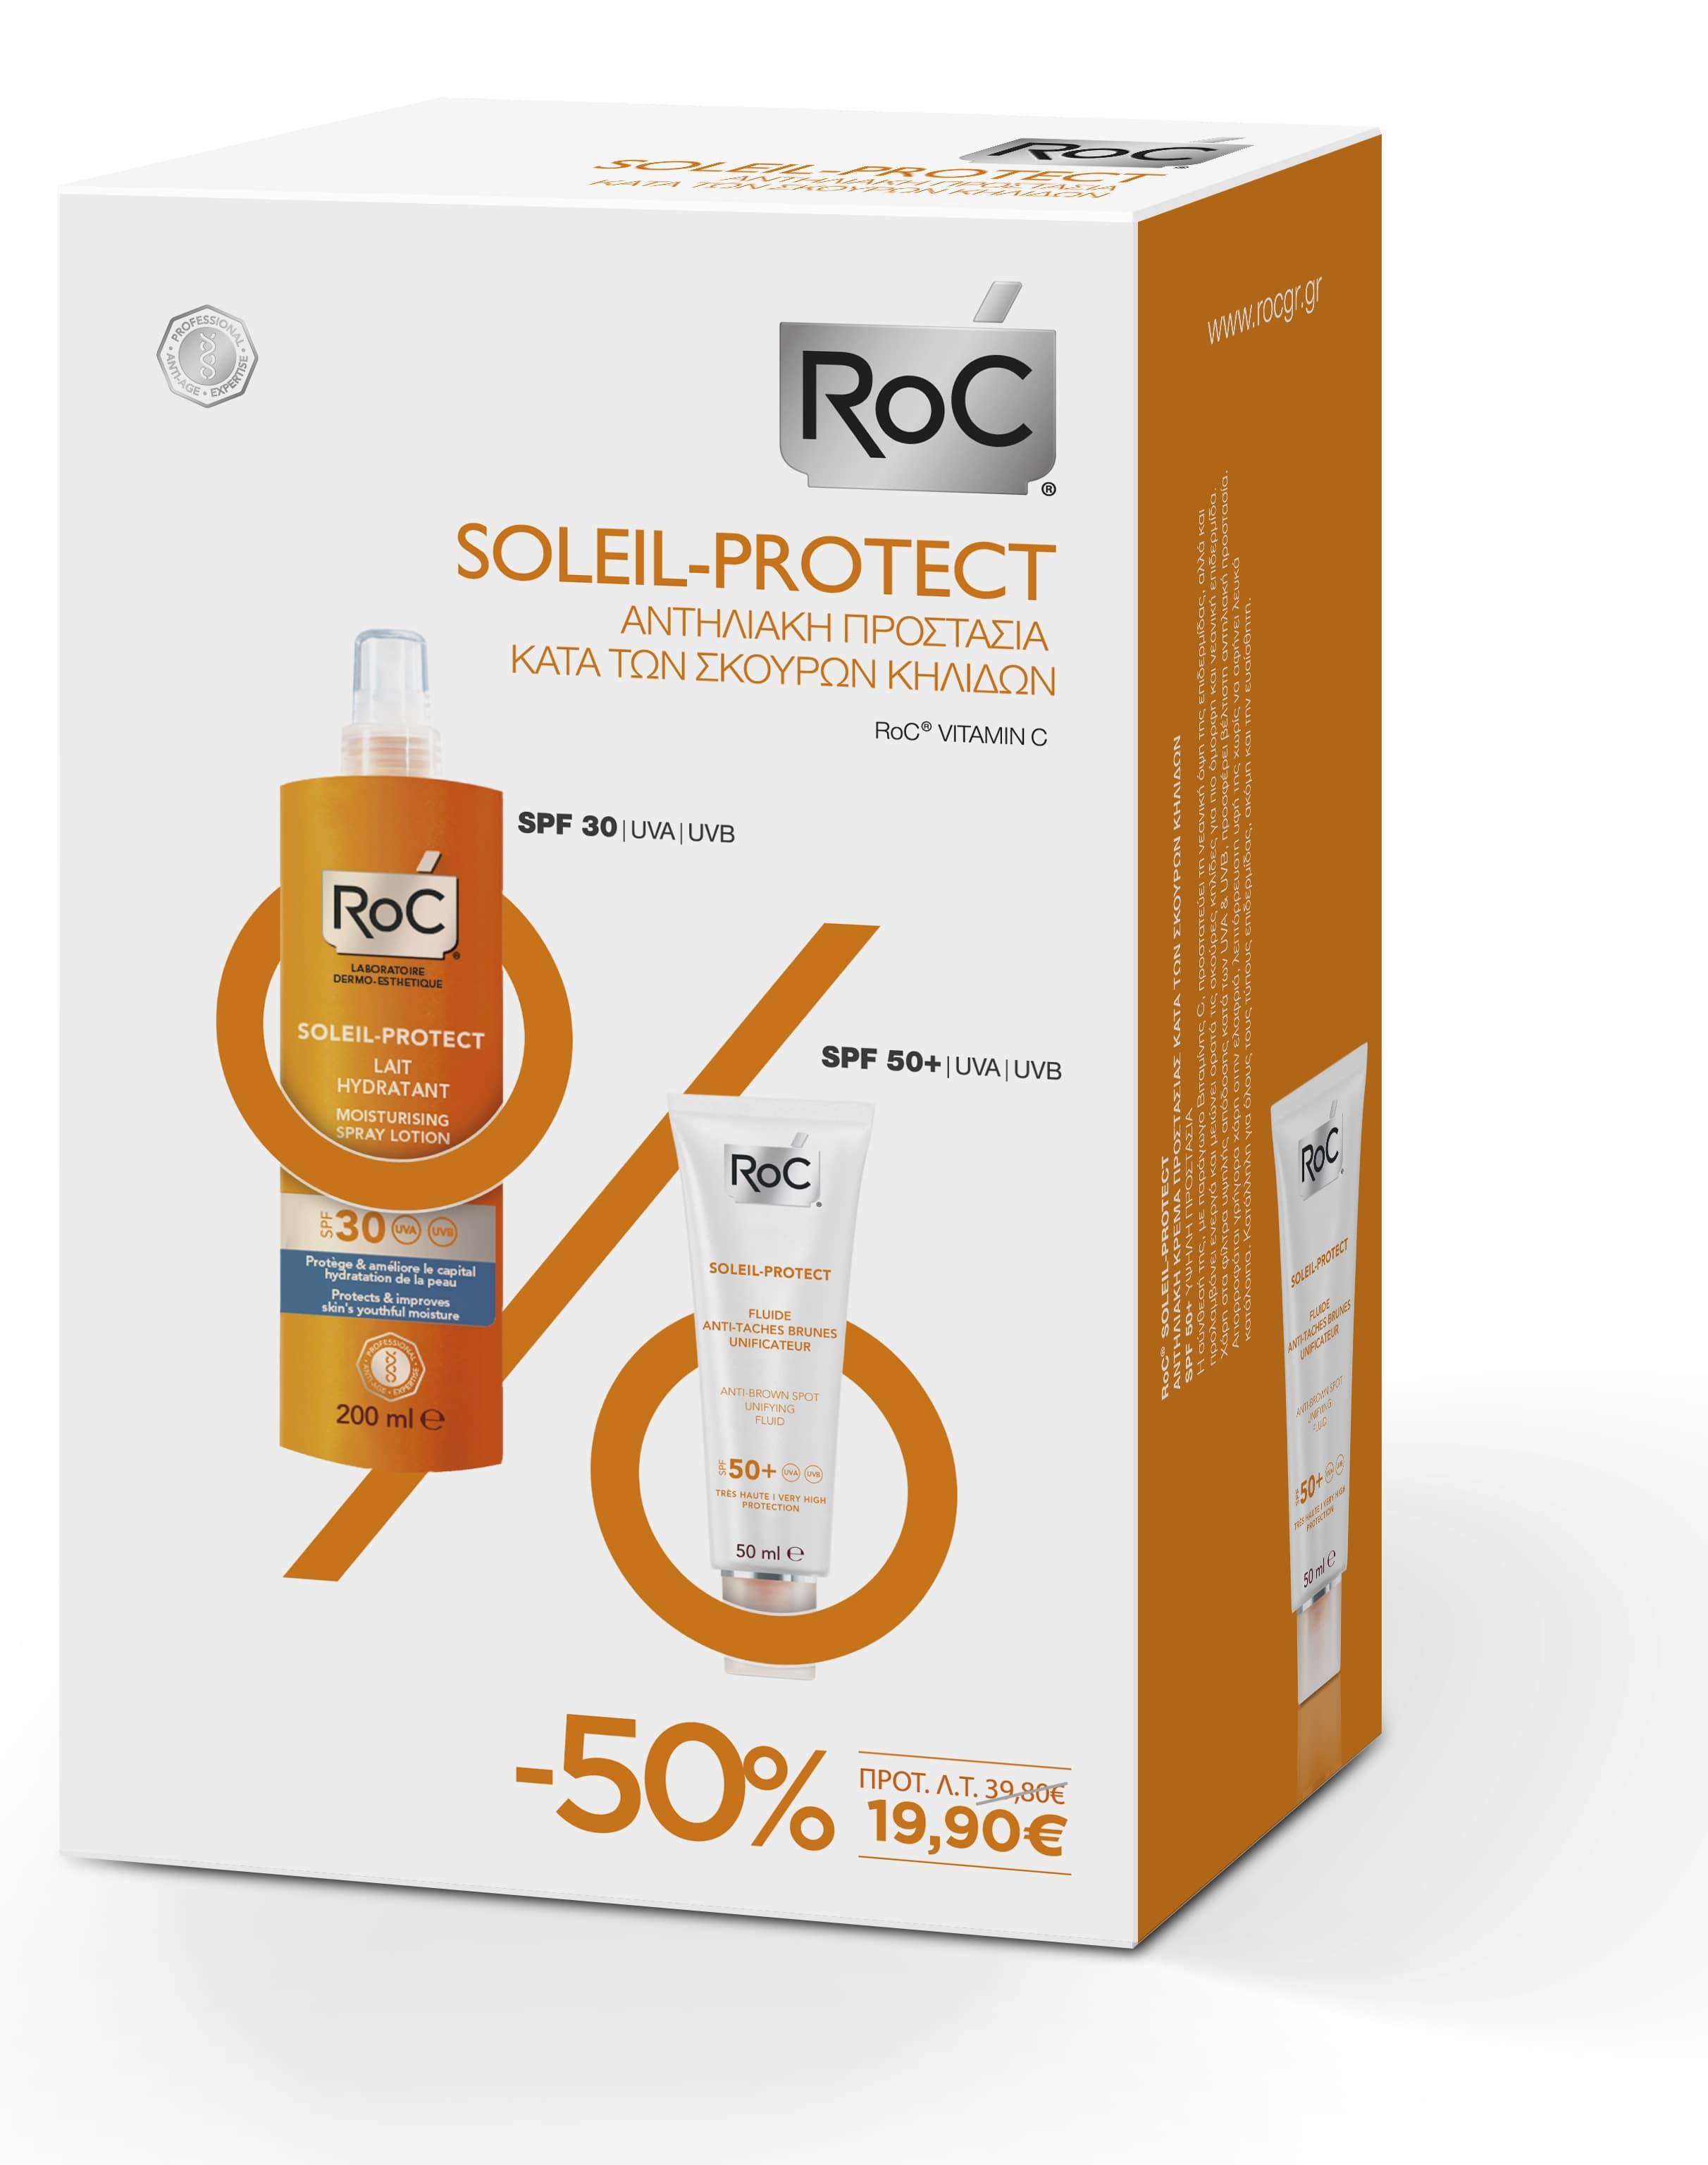 Roc Promo Pack με Soleil Protect Anti-Brown Cream SPF50+ Αντιηλιακή Κρέμα Προσώπου κατά των κηλίδων, 50ml & Soleil Protect Lotion Body Spray SPF30 Αντηλιακό Γαλάκτωμα Σώματος, 200ml